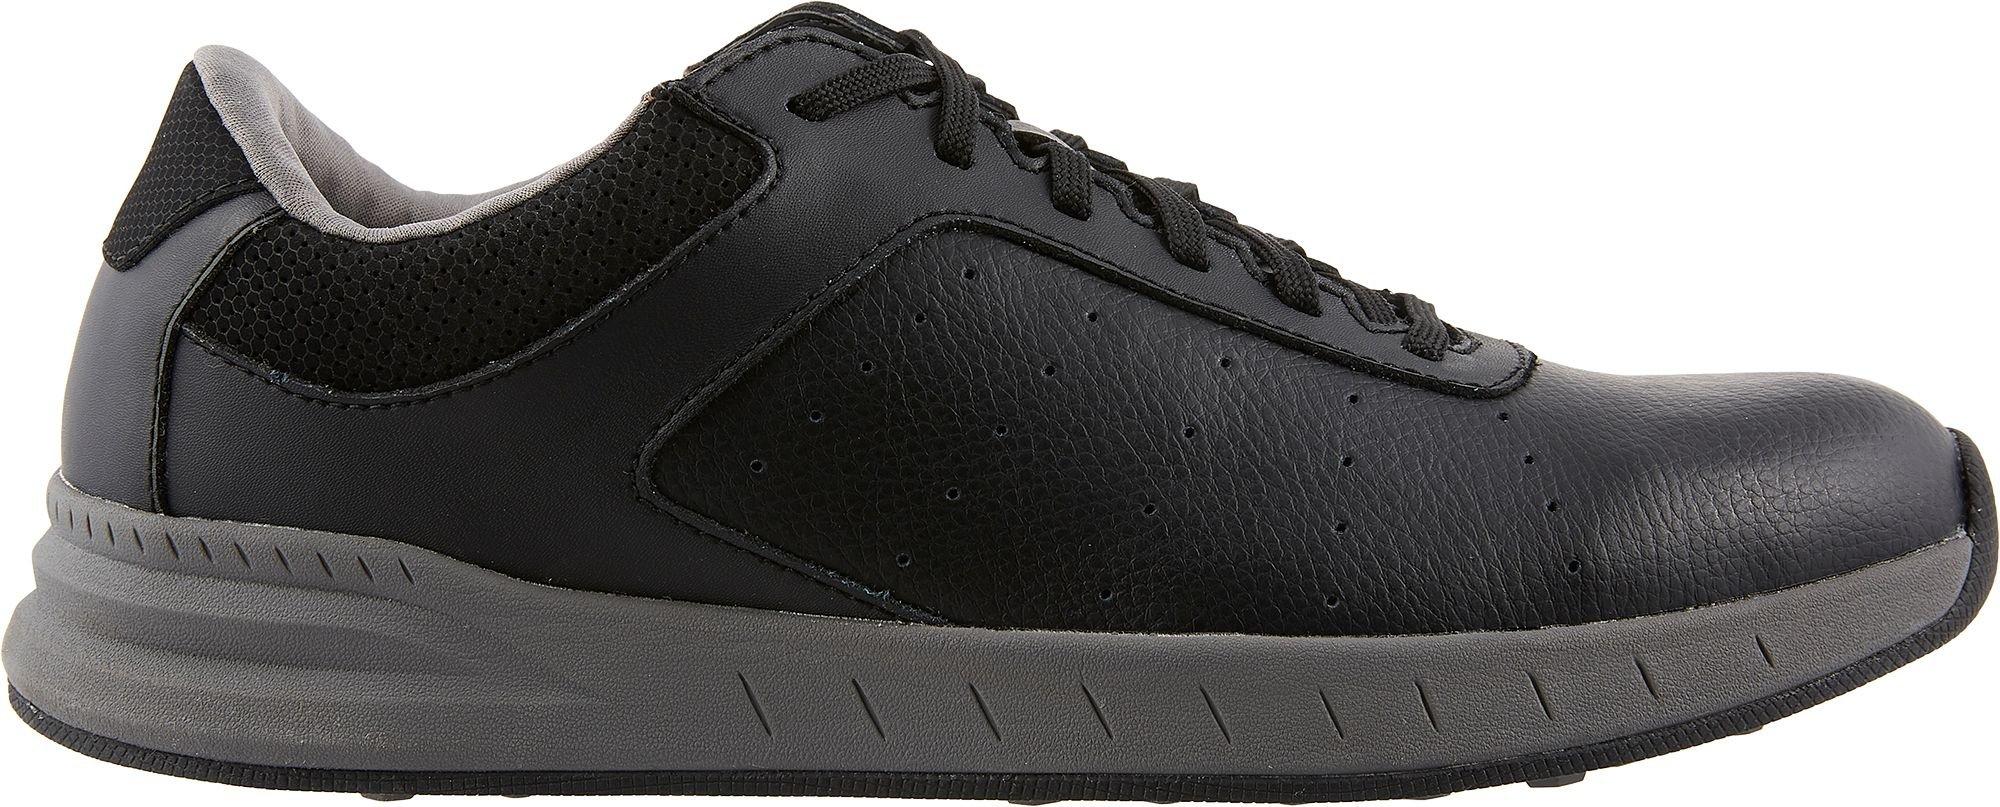 Walter Hagen Course Casual Golf Shoes (8-M, Black)